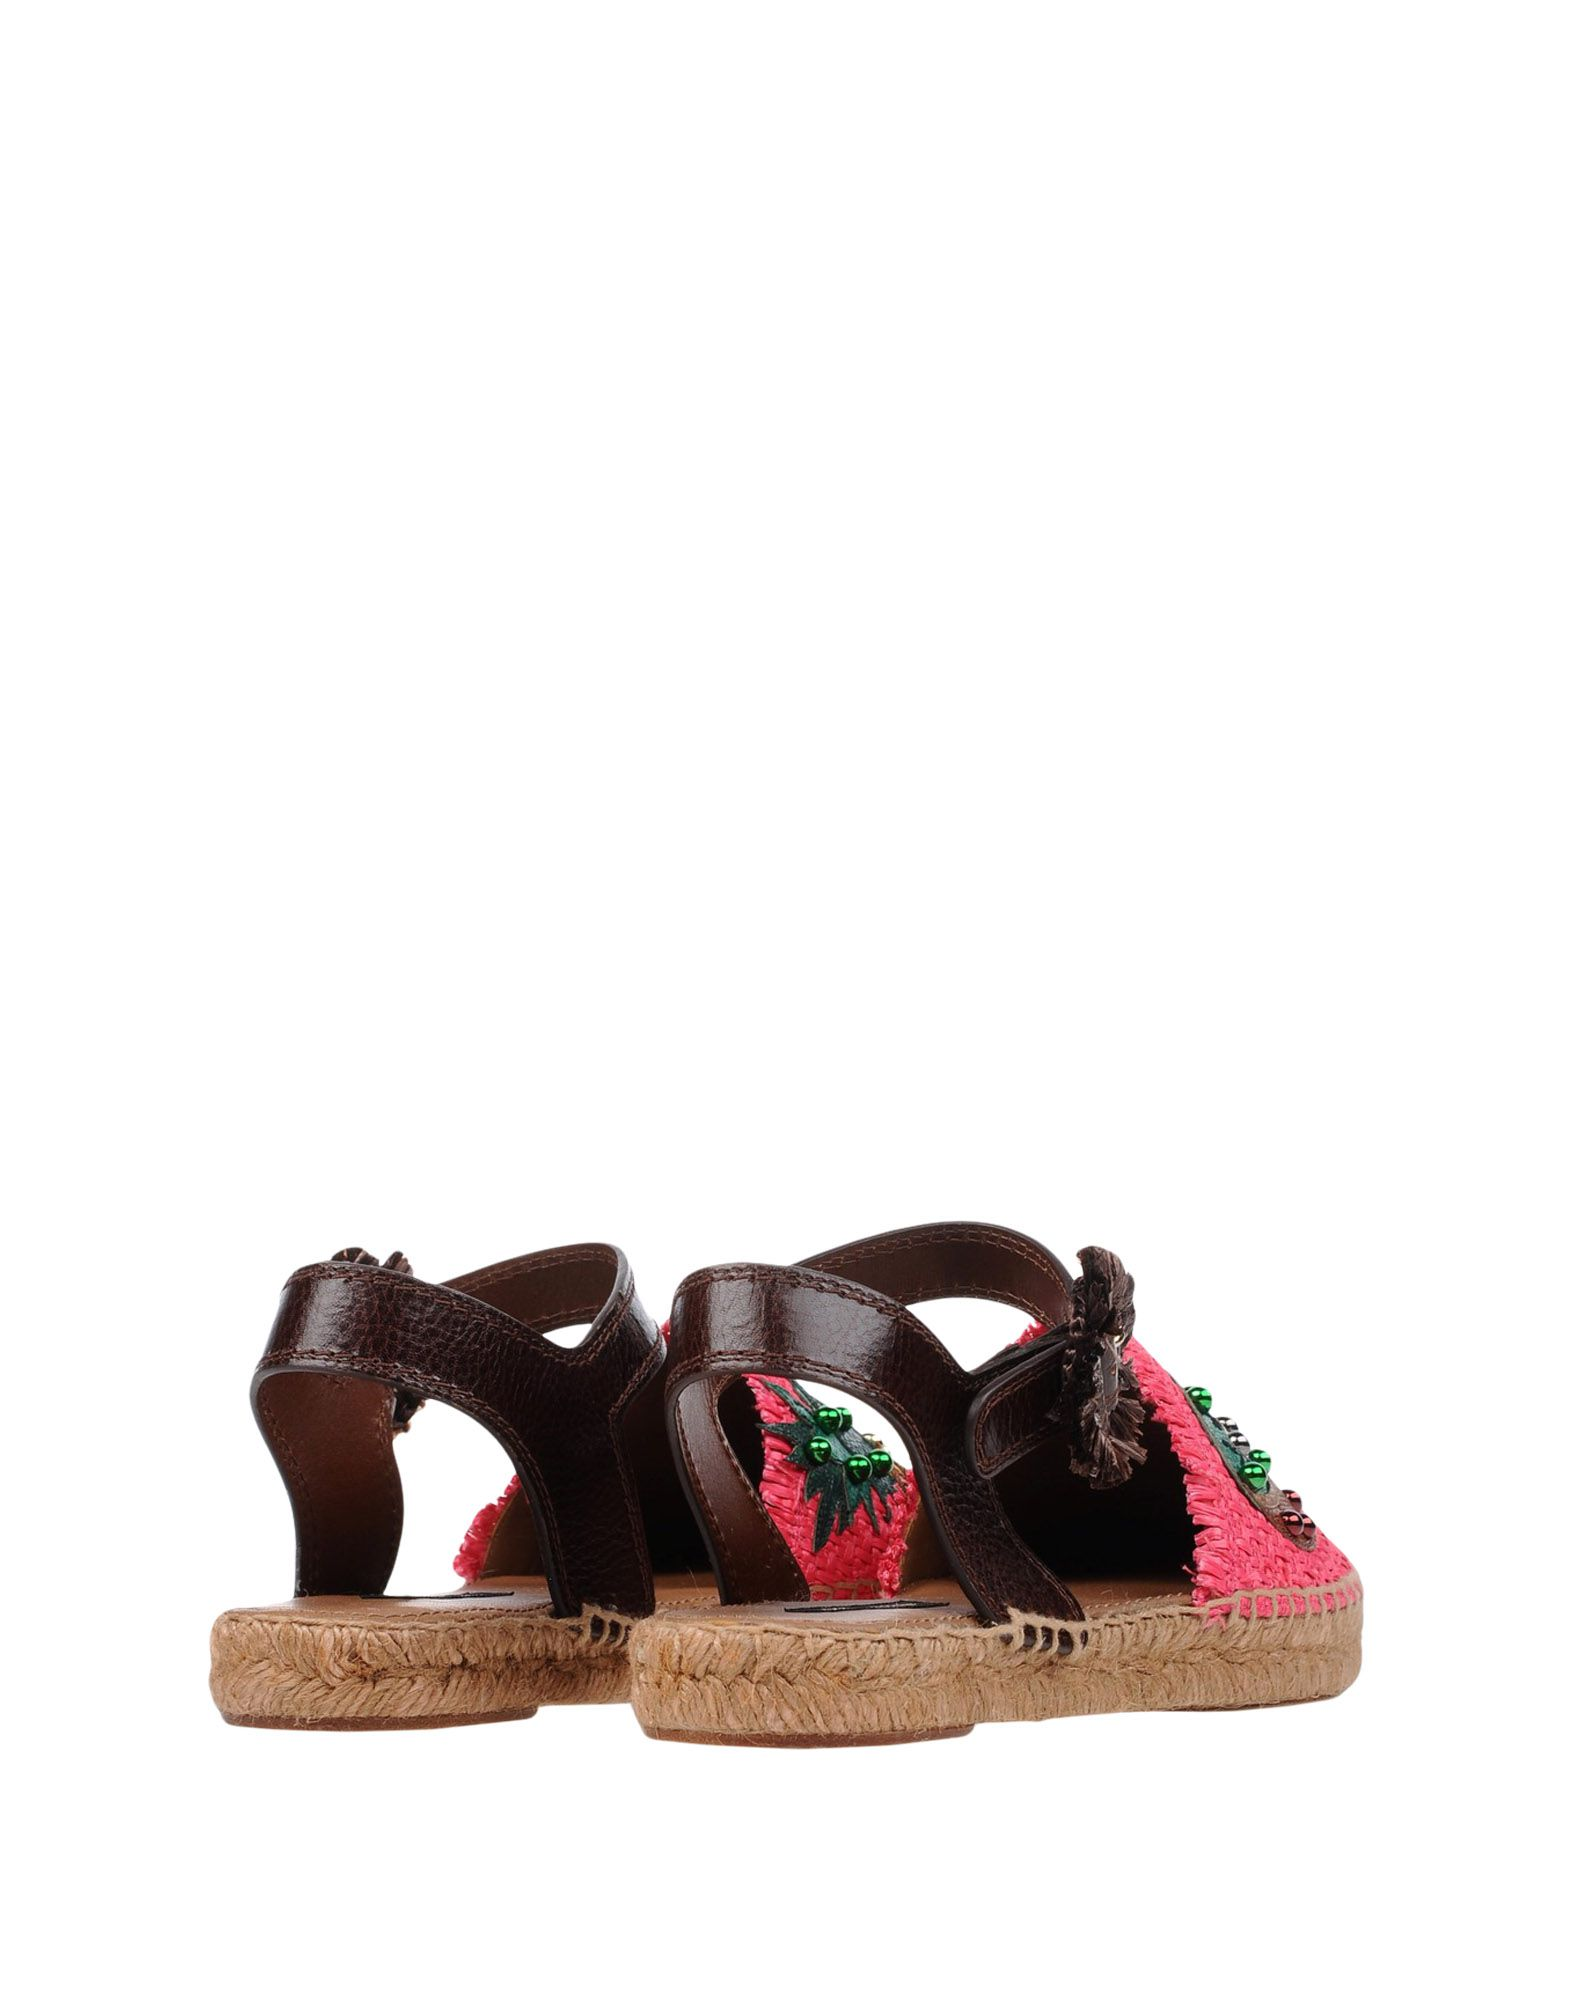 Espadrilles Dolce & Gabbana Femme - Espadrilles Dolce & Gabbana sur